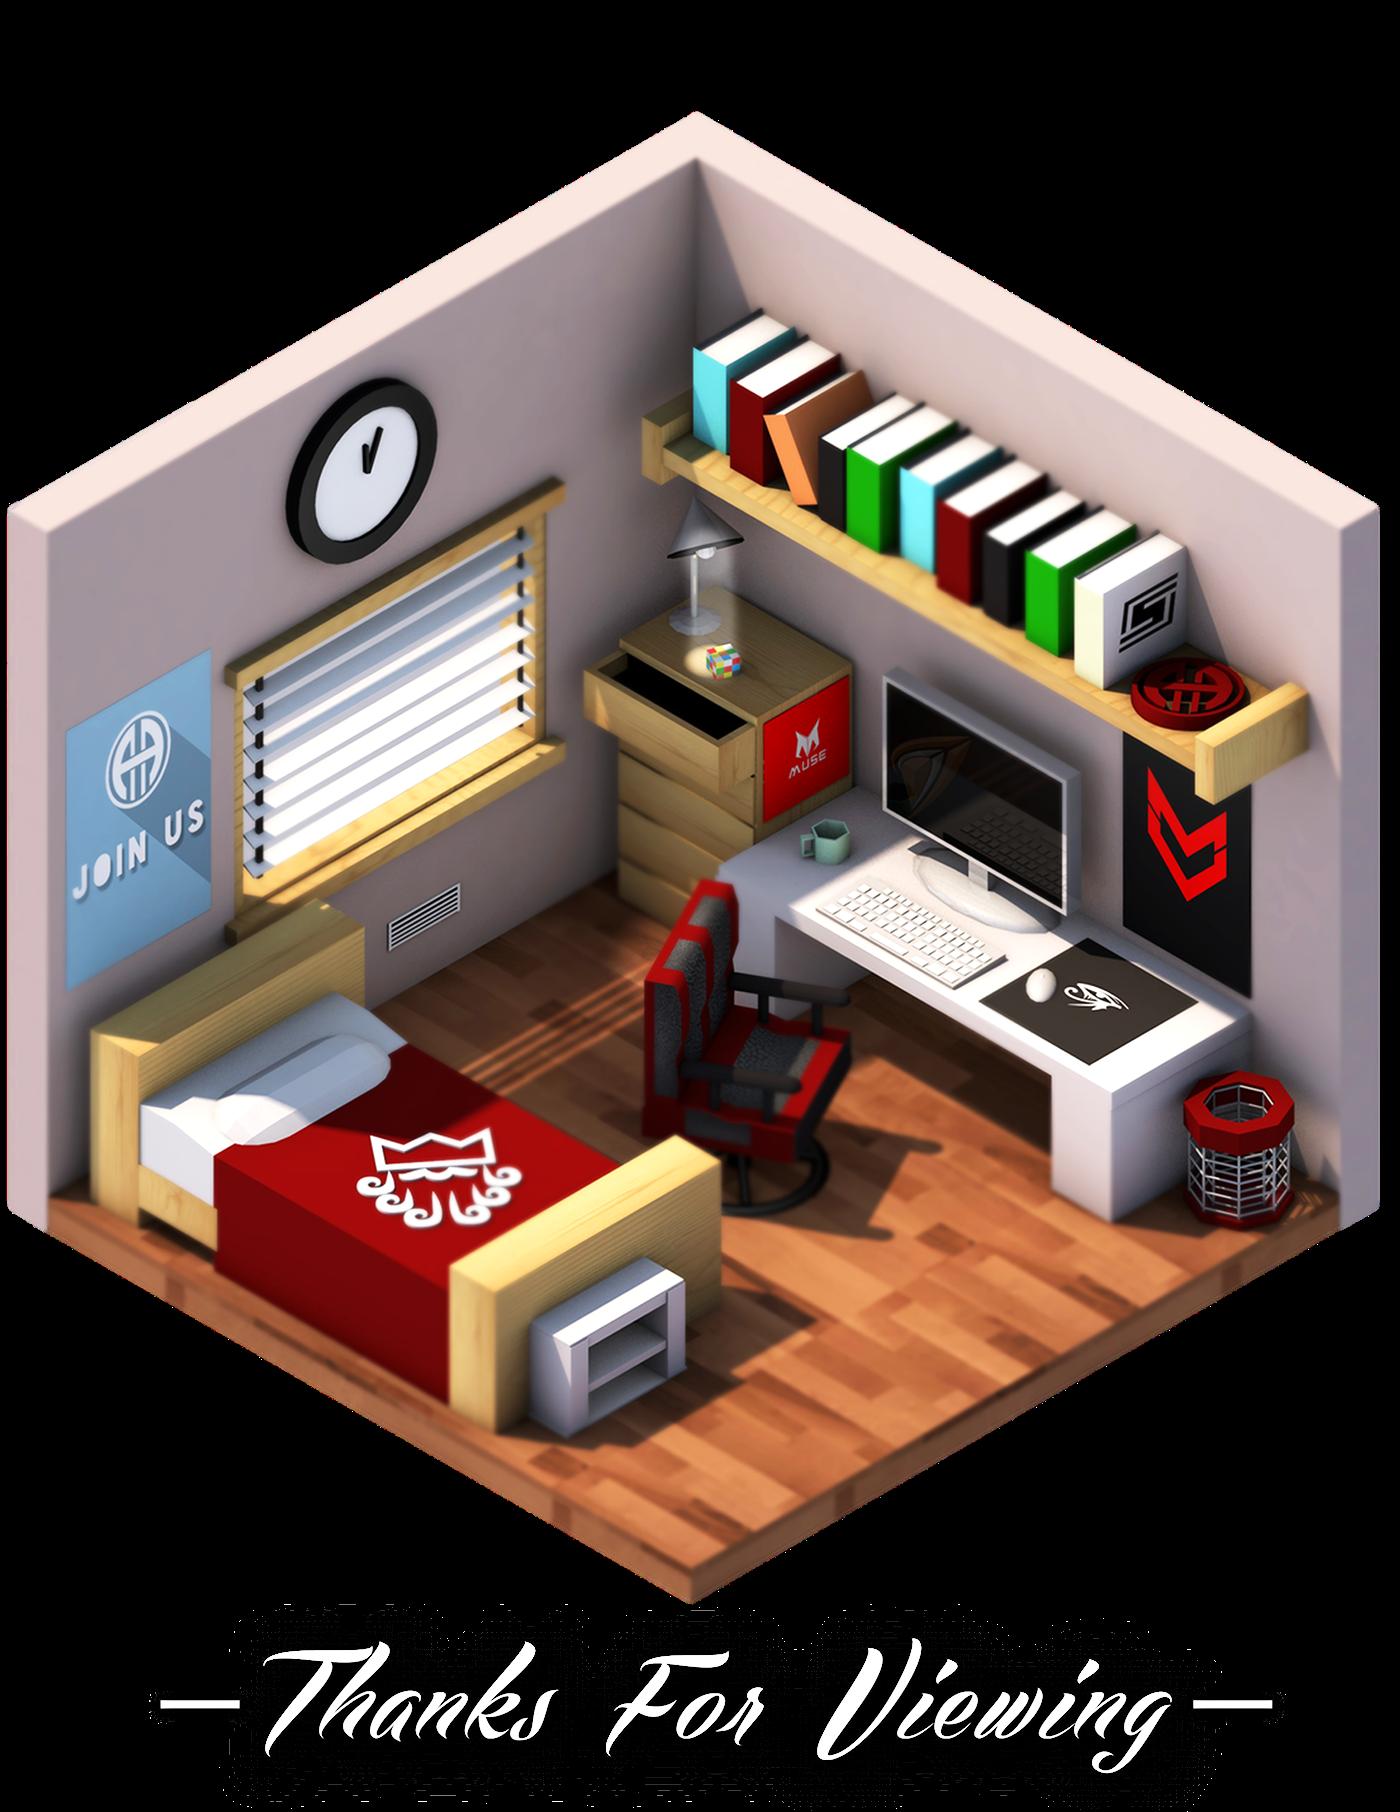 Isometric Bedroom A Designers Room On Behance